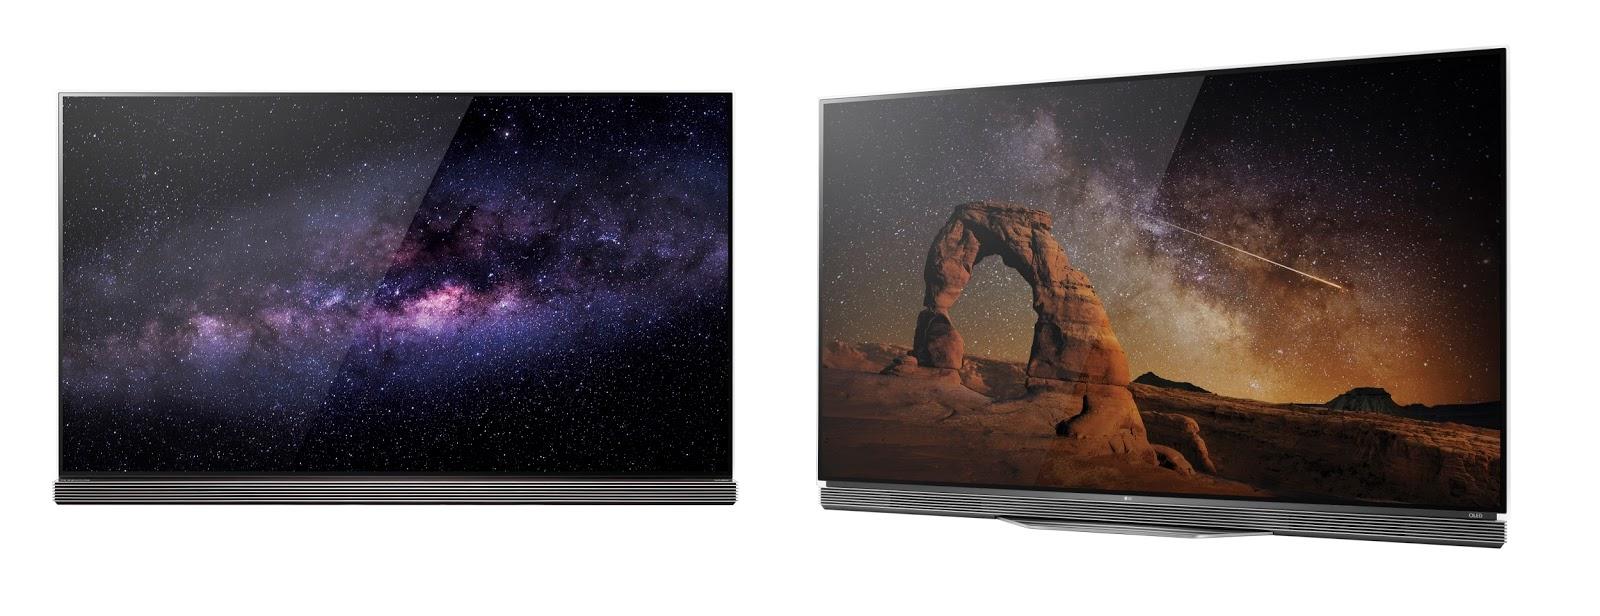 LG OLED TV E6 and G6 revealed at CES 2016